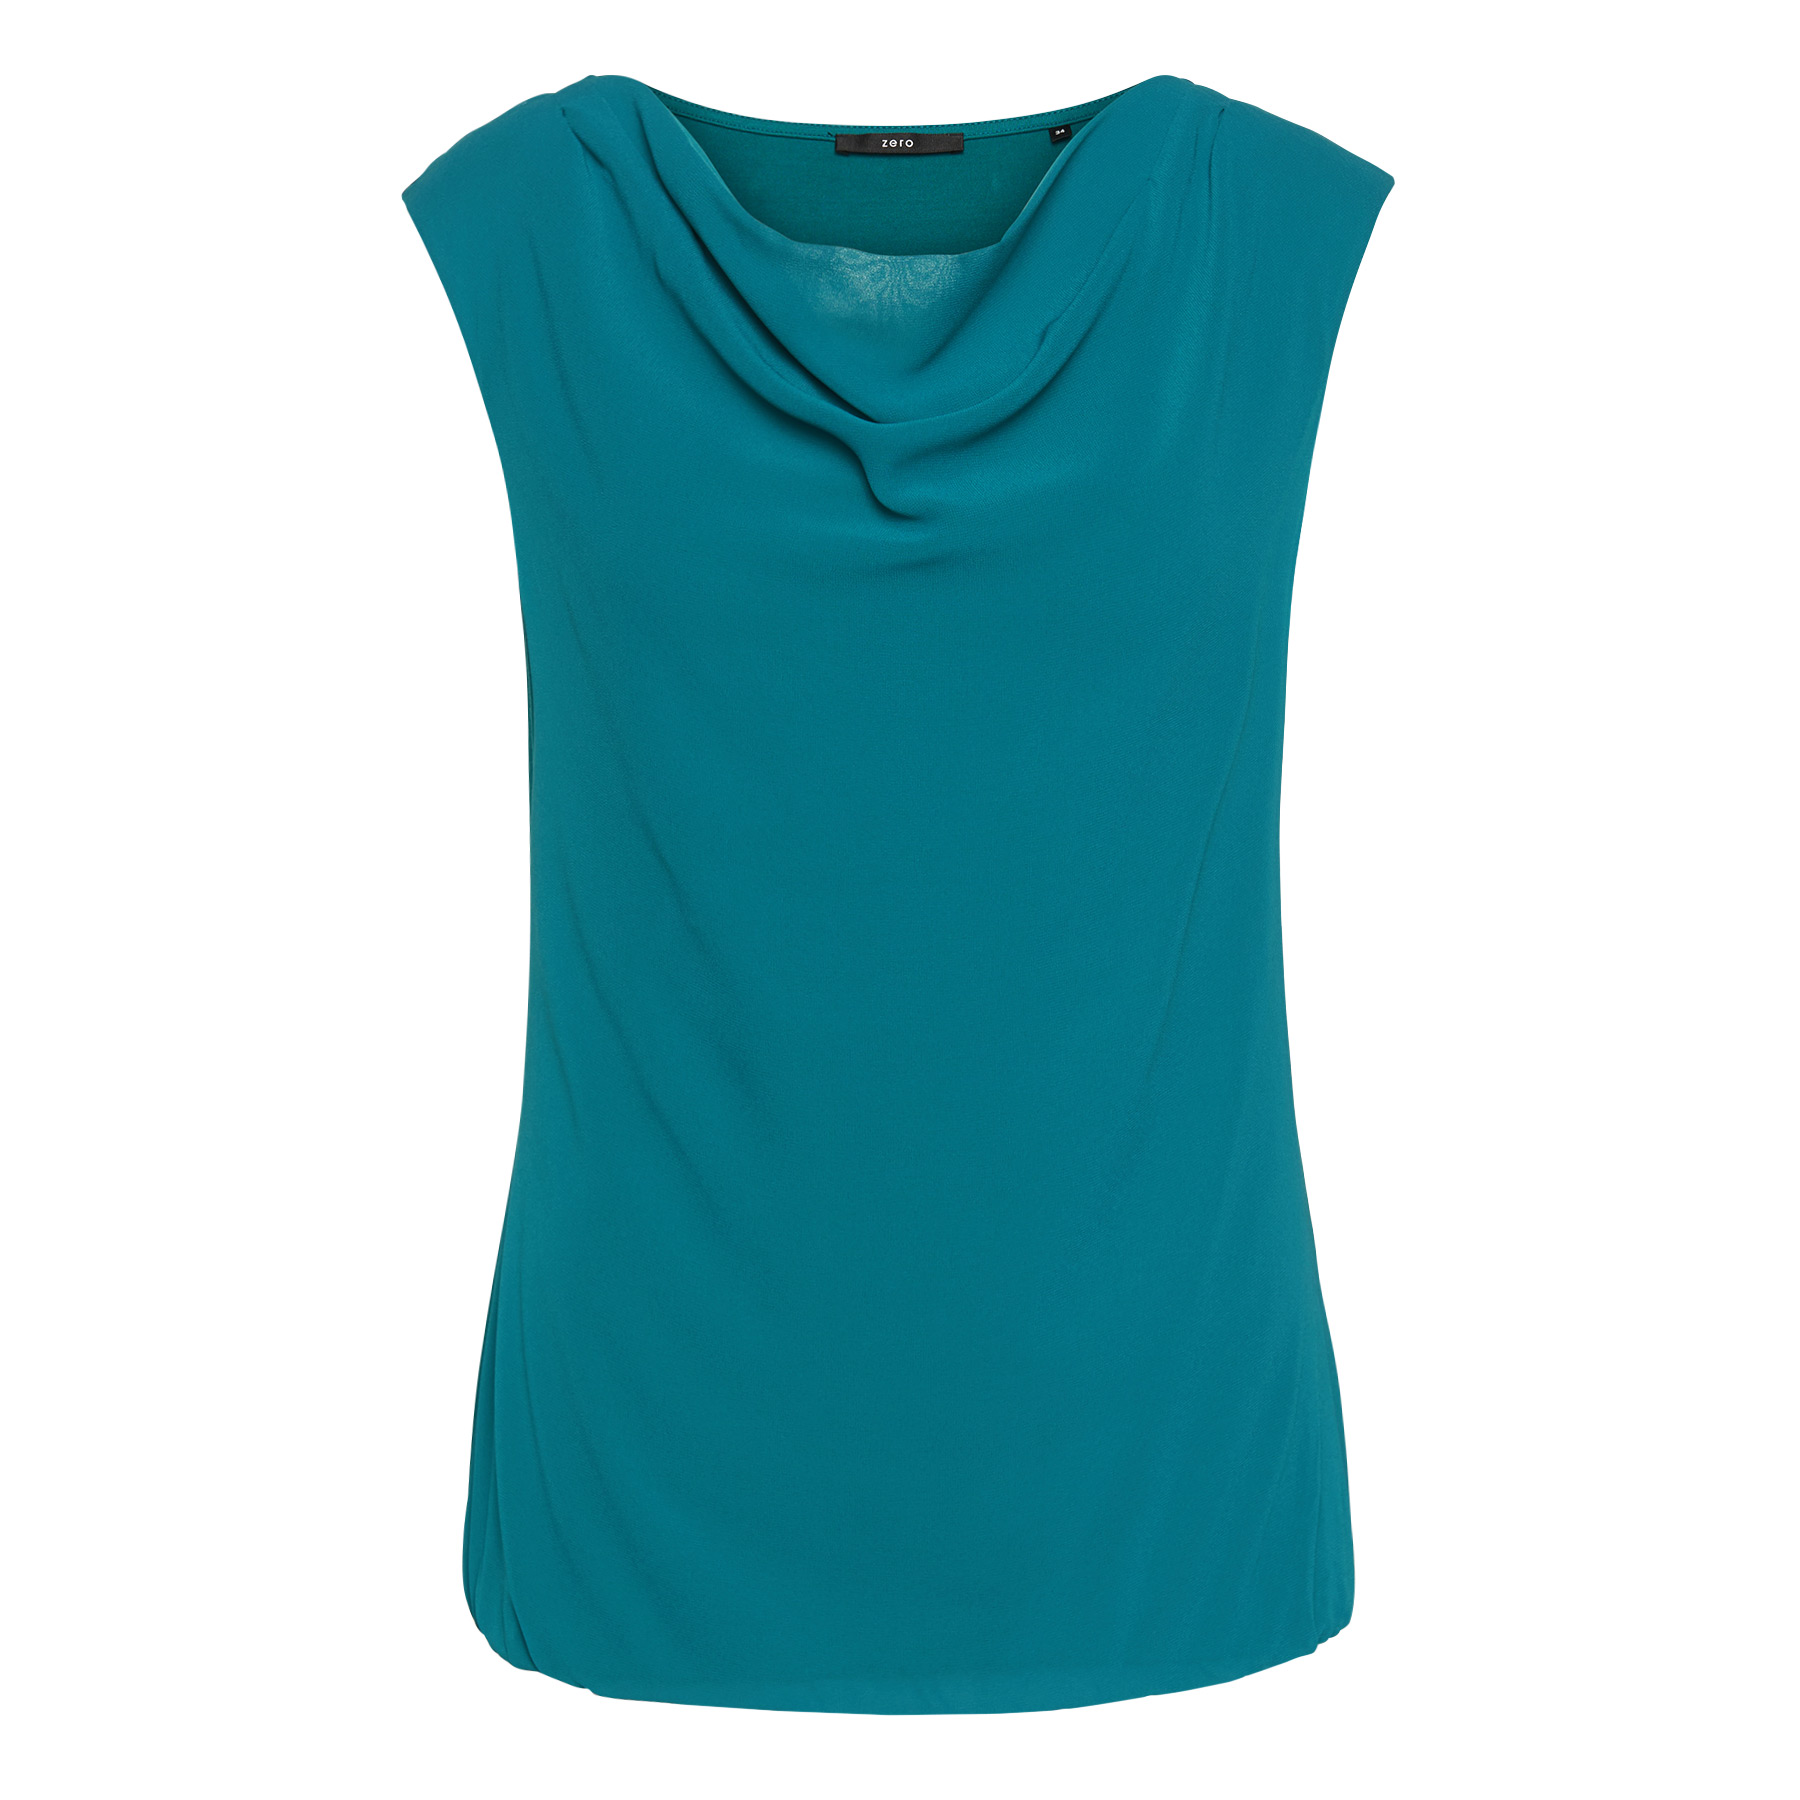 Blusenshirt mit Chiffon-Front teal green